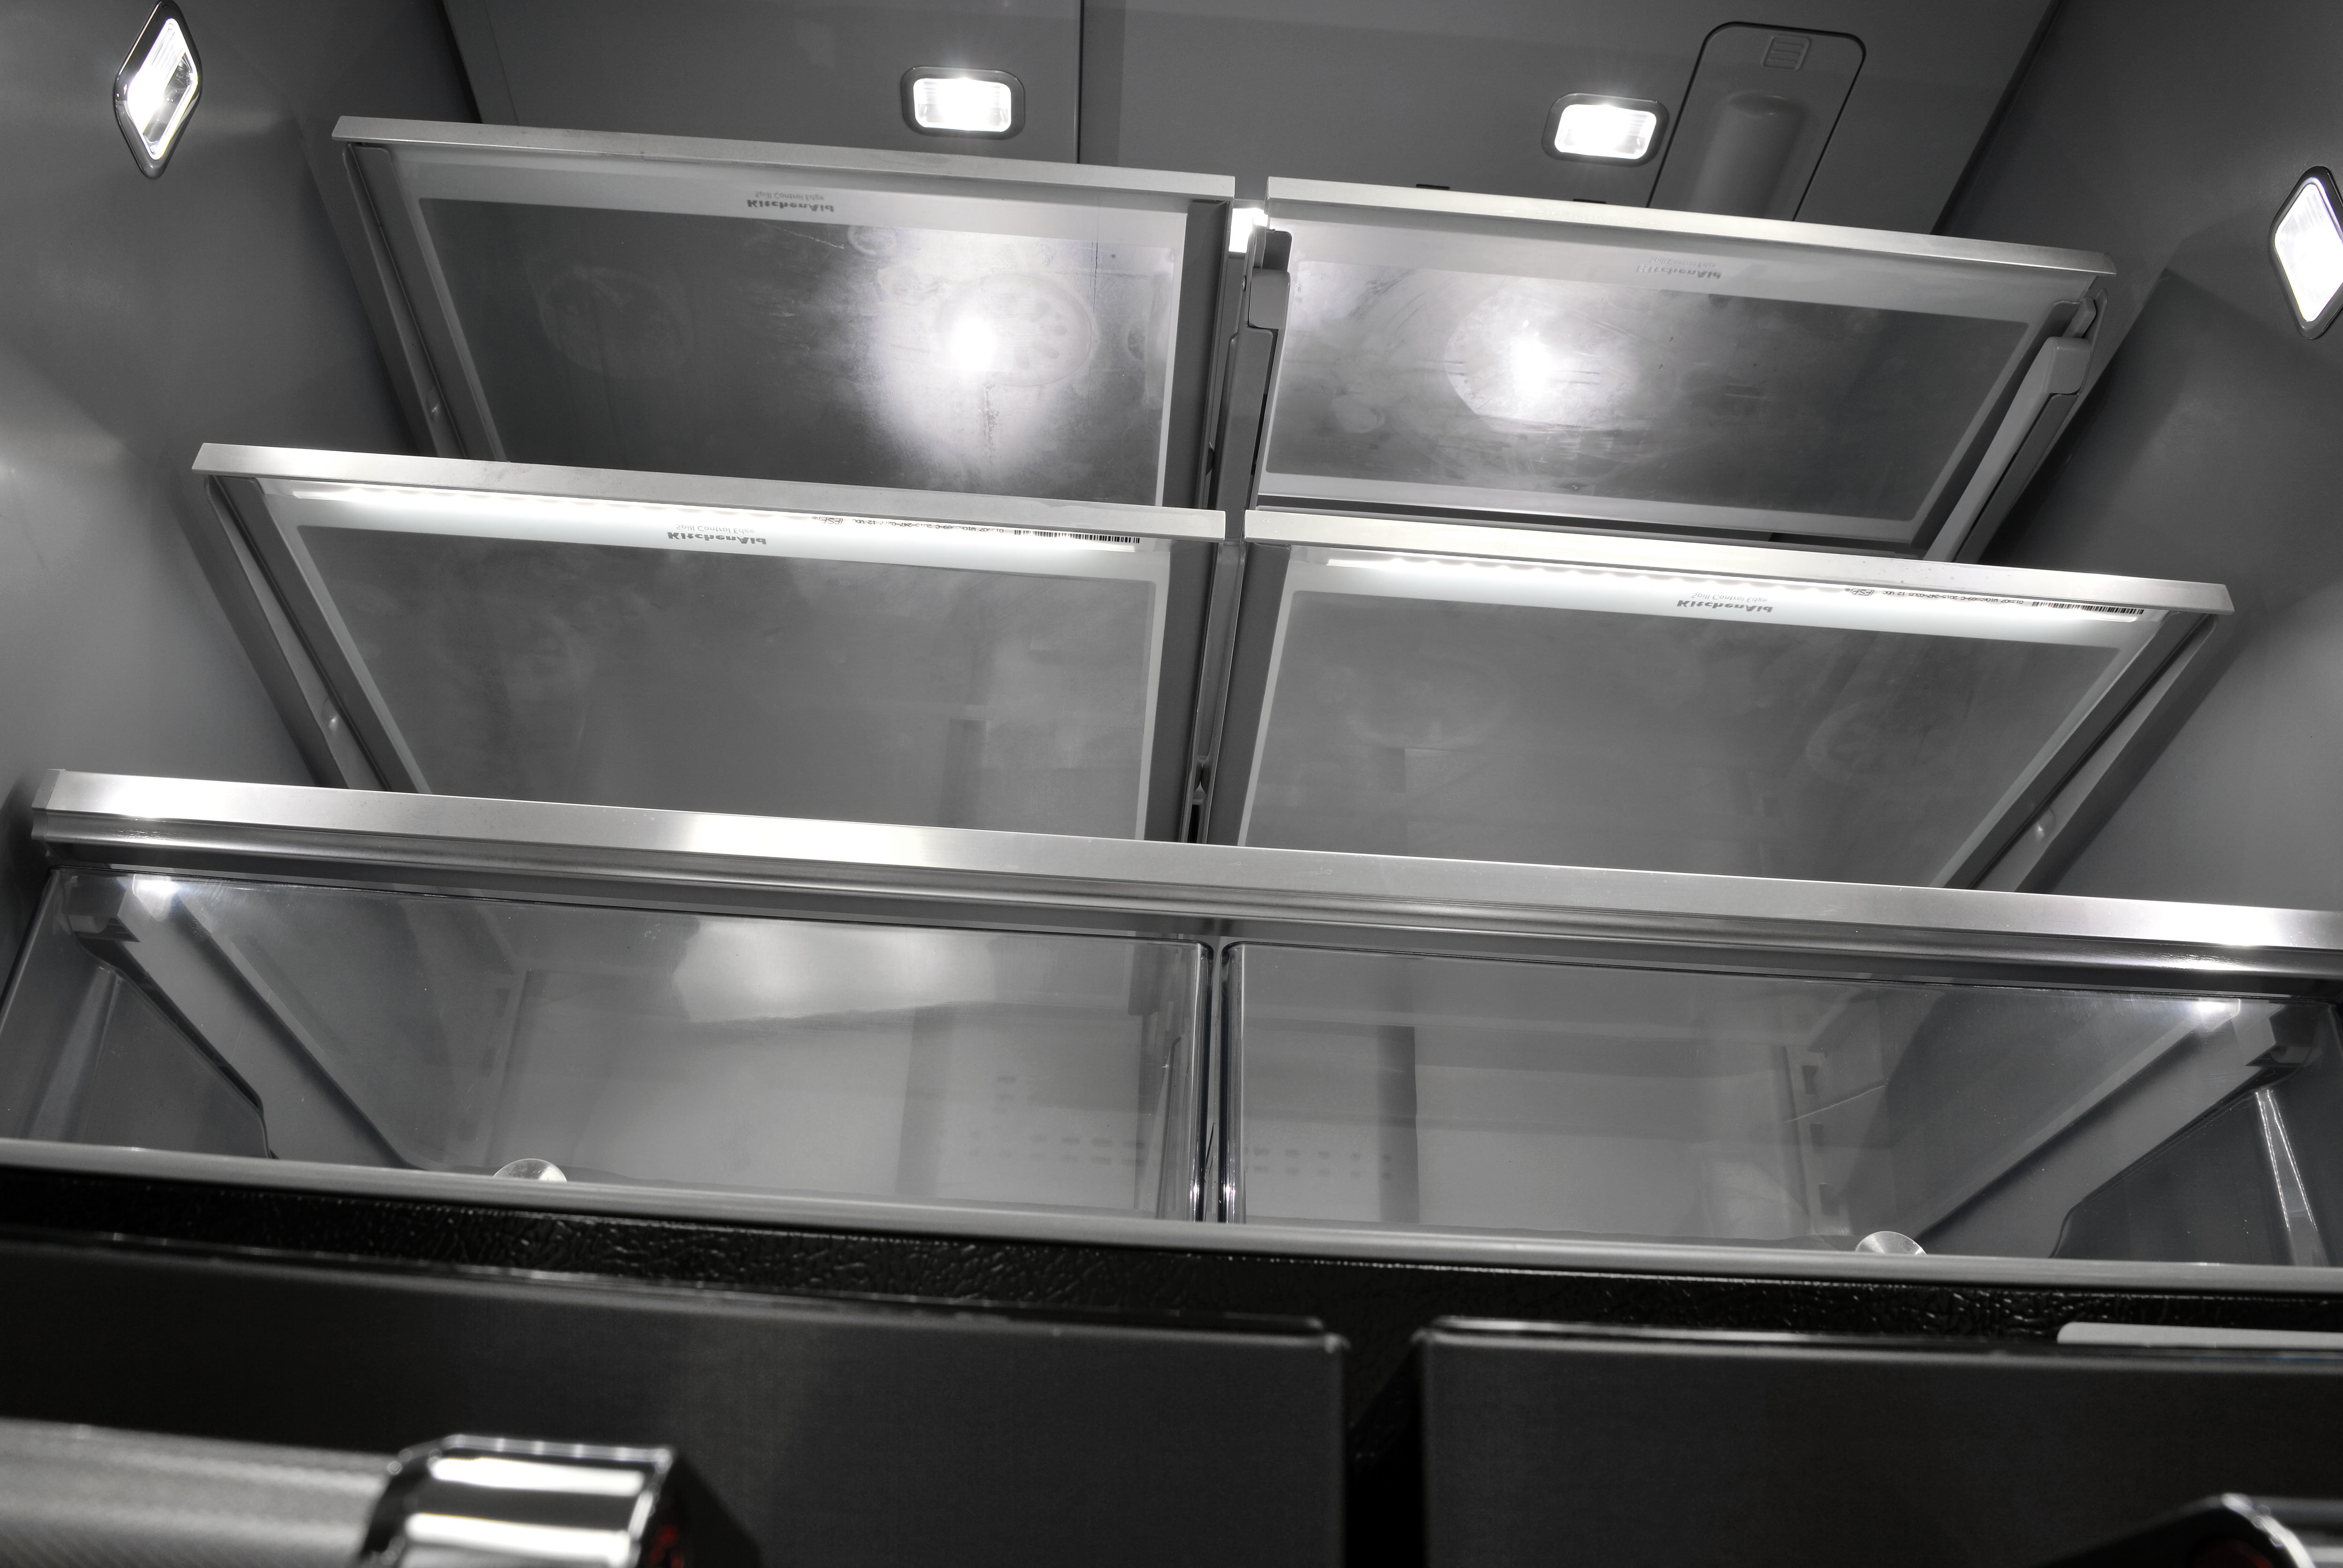 Kitchenaid Refrigerator Shelves - Refrigerator Repair Ideas